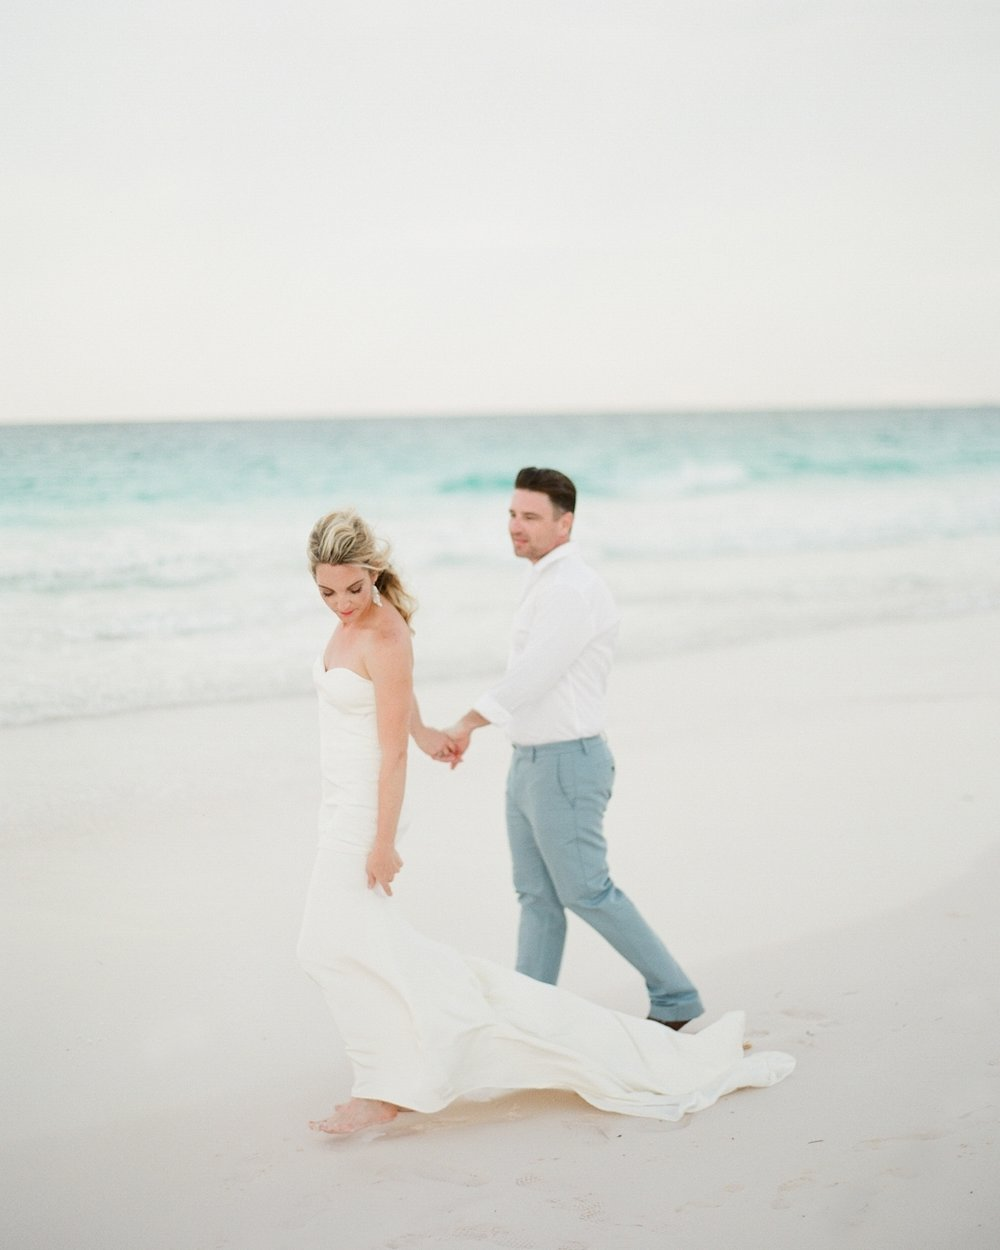 Daniel & Kate - HARBOUR ISLAN BAHAMAS- WEDDING